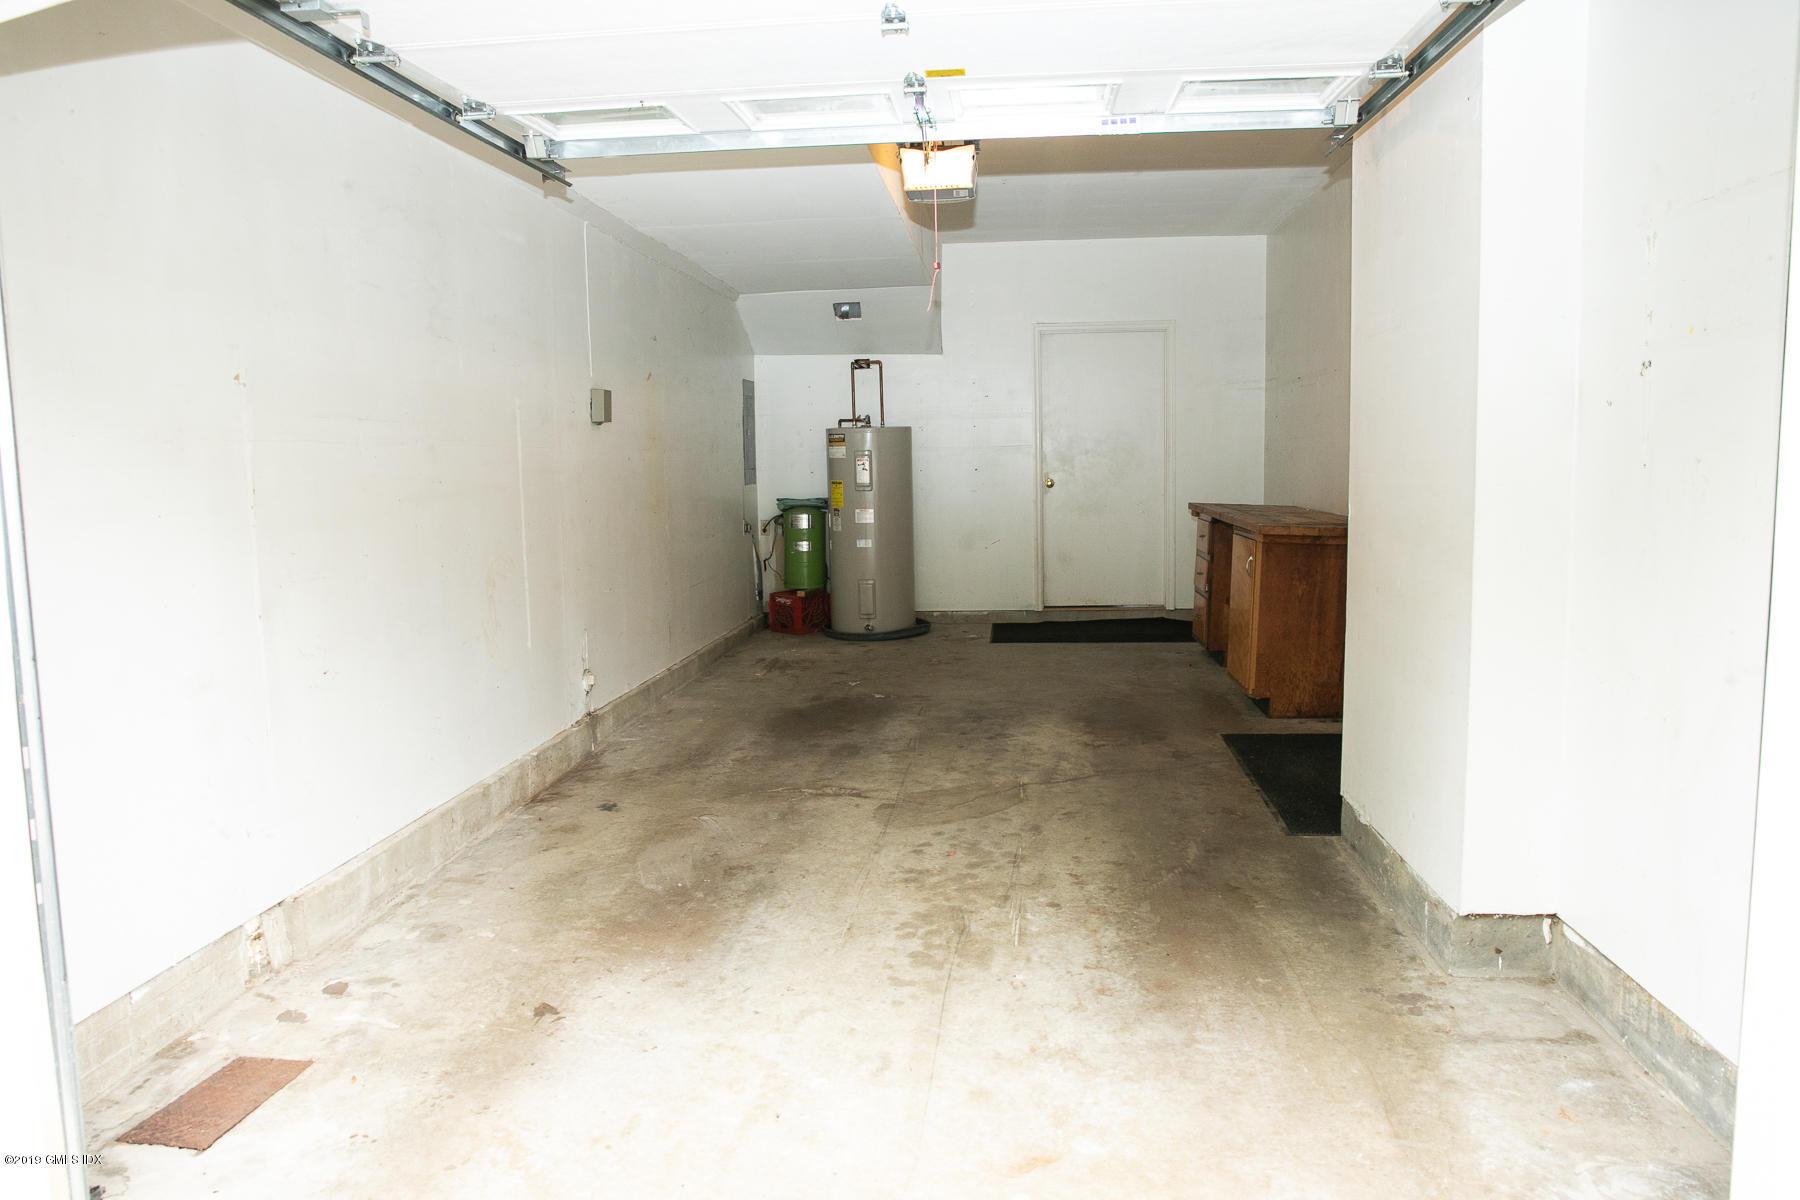 115 River Road,Cos Cob,Connecticut 06807,2 Bedrooms Bedrooms,2 BathroomsBathrooms,Condominium,River,106610